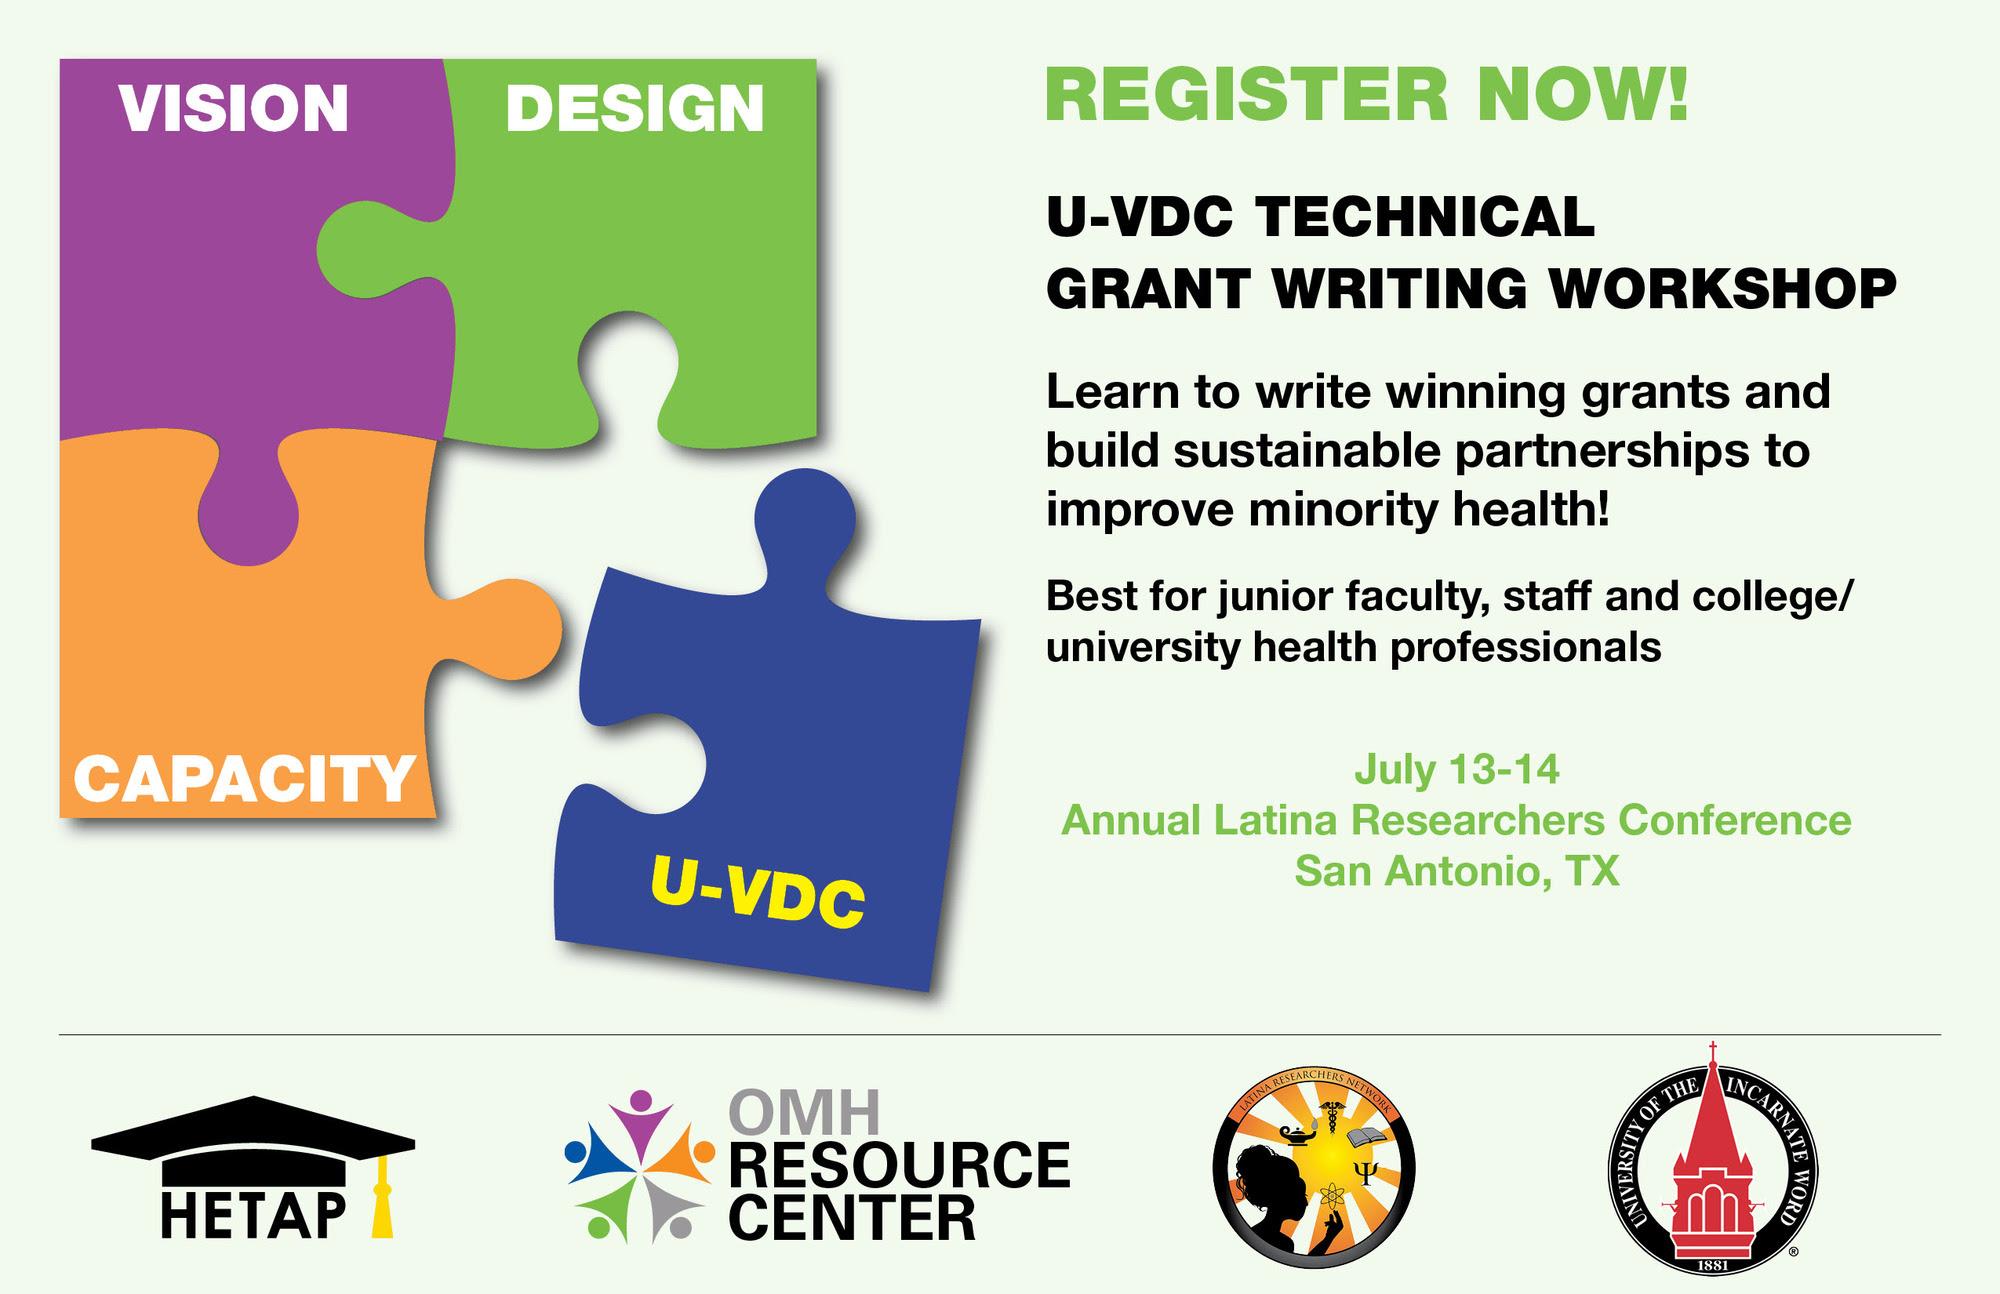 Vision Design Capacity U-VDC Grants Writing Technical Workshop July 13-14 Latina Research Network Conference San Antonio, TX